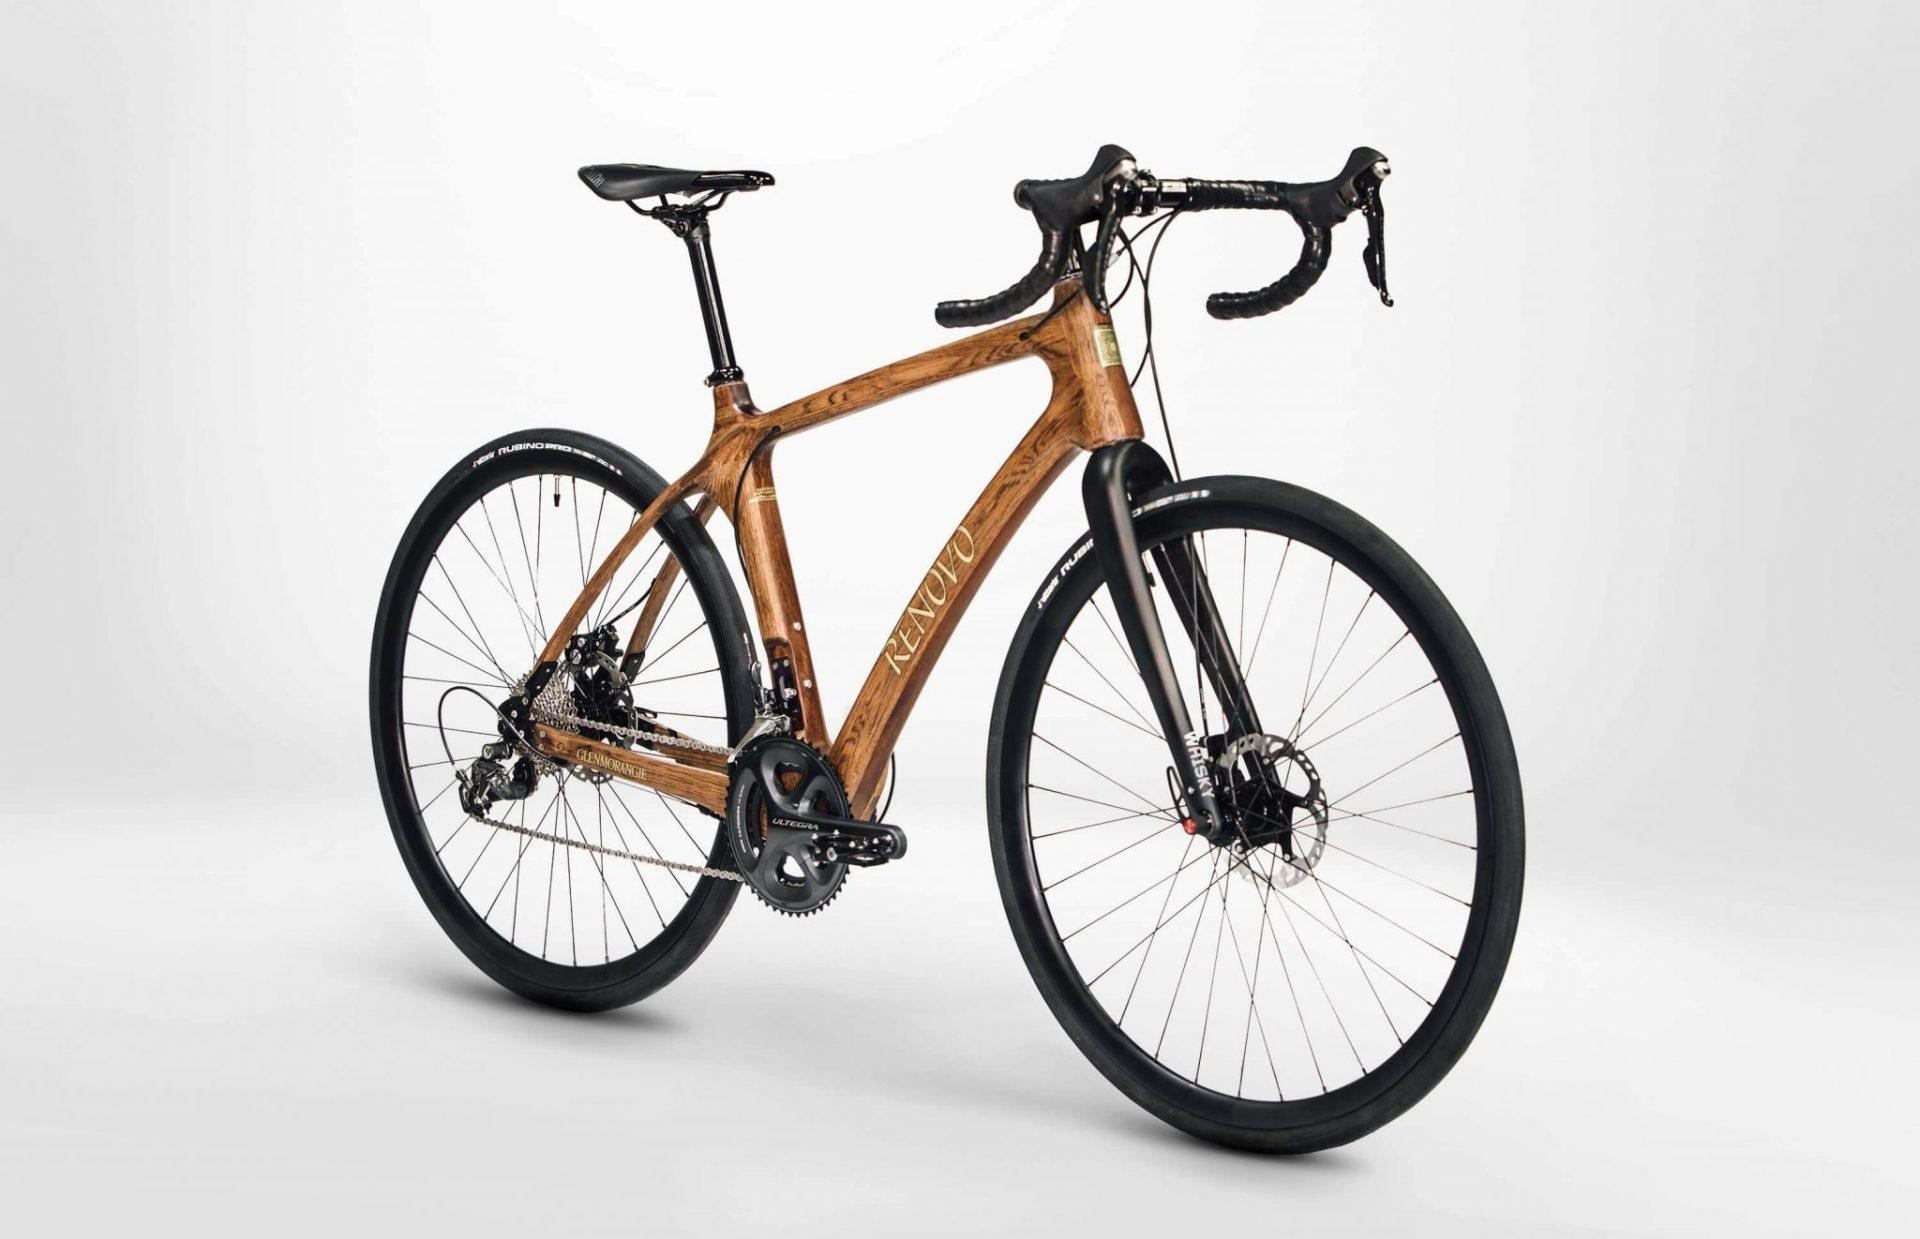 Renovo x Glenmorangie - Wooden Bikes from Whisky Casks 7